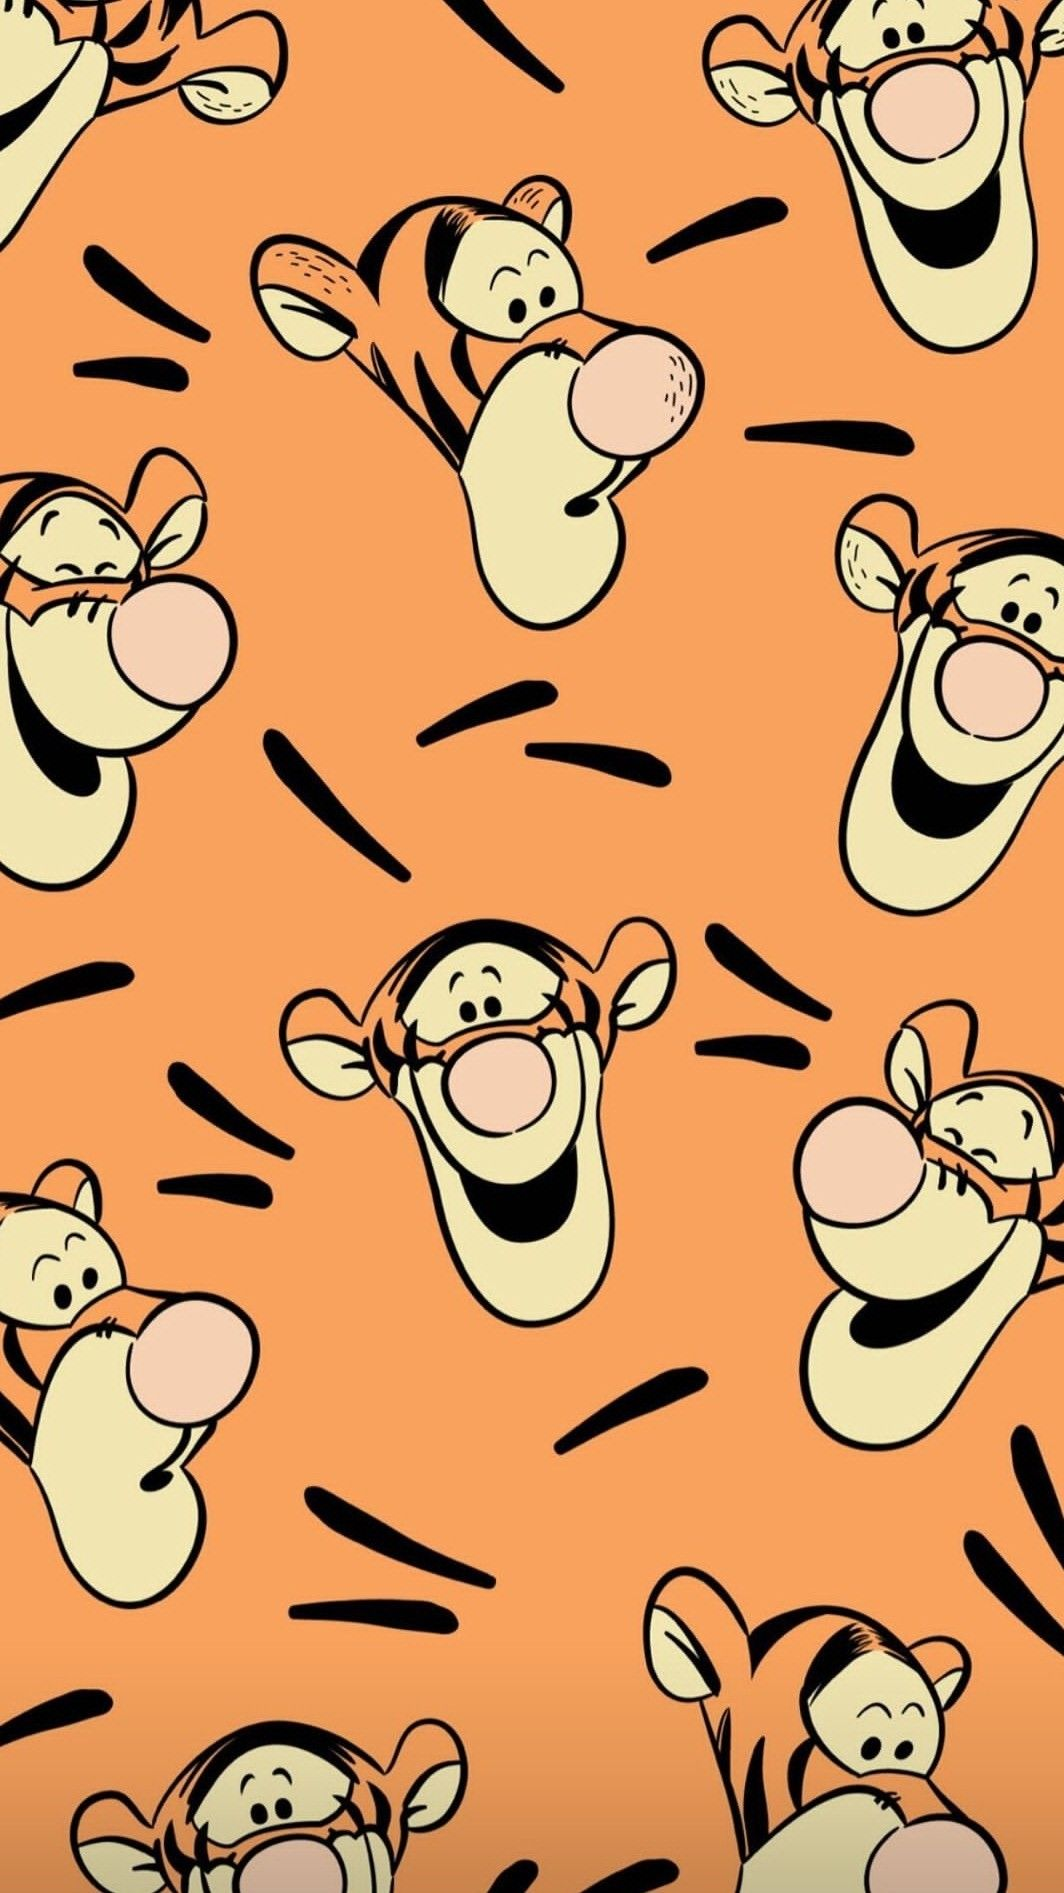 Tigger Winnie The Pooh Cartoon Wallpaper Iphone Disney Phone Wallpaper Winnie The Pooh Pictures